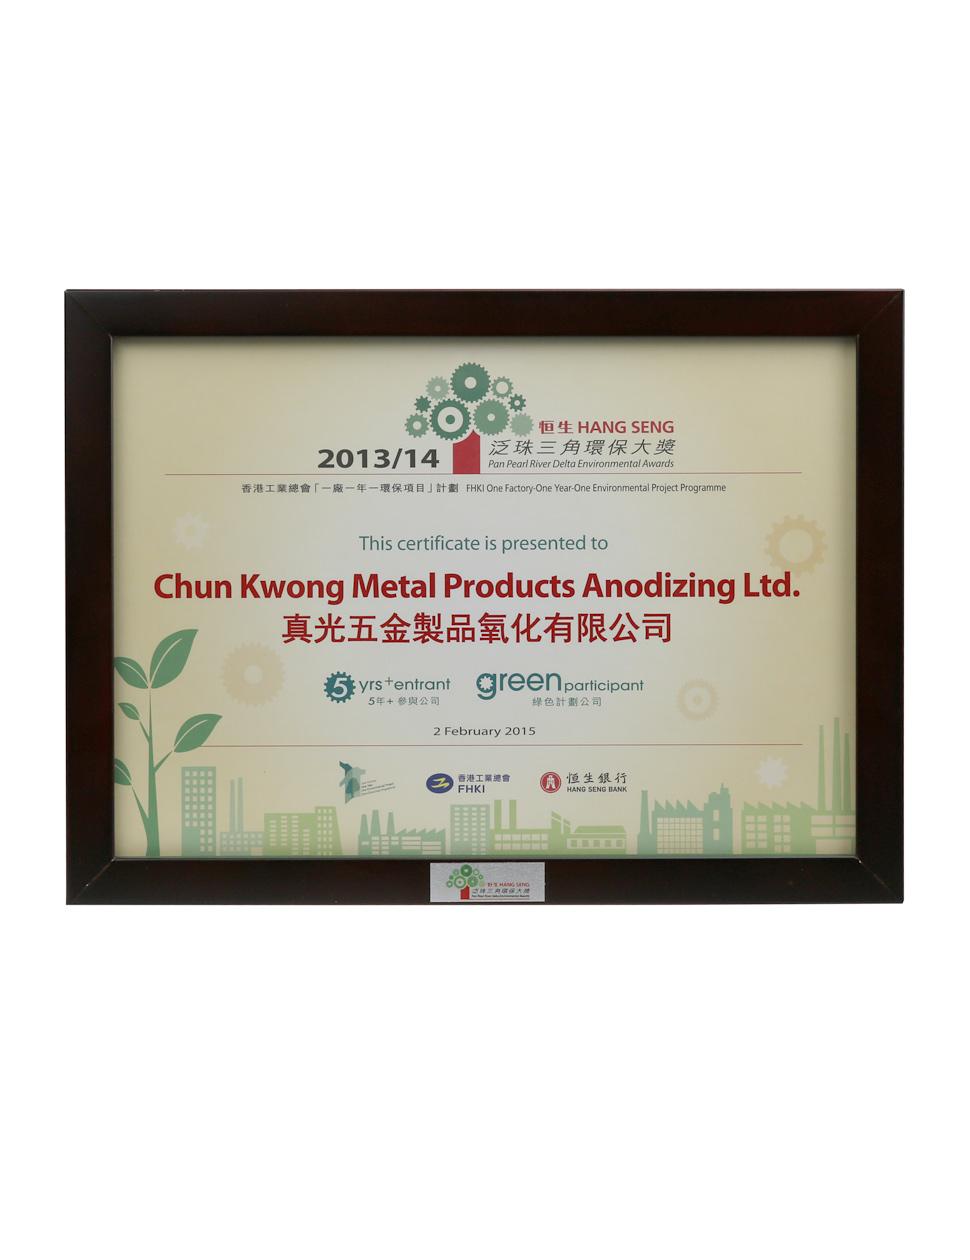 Chun Kwong Metal Products Anodizing Ltd.